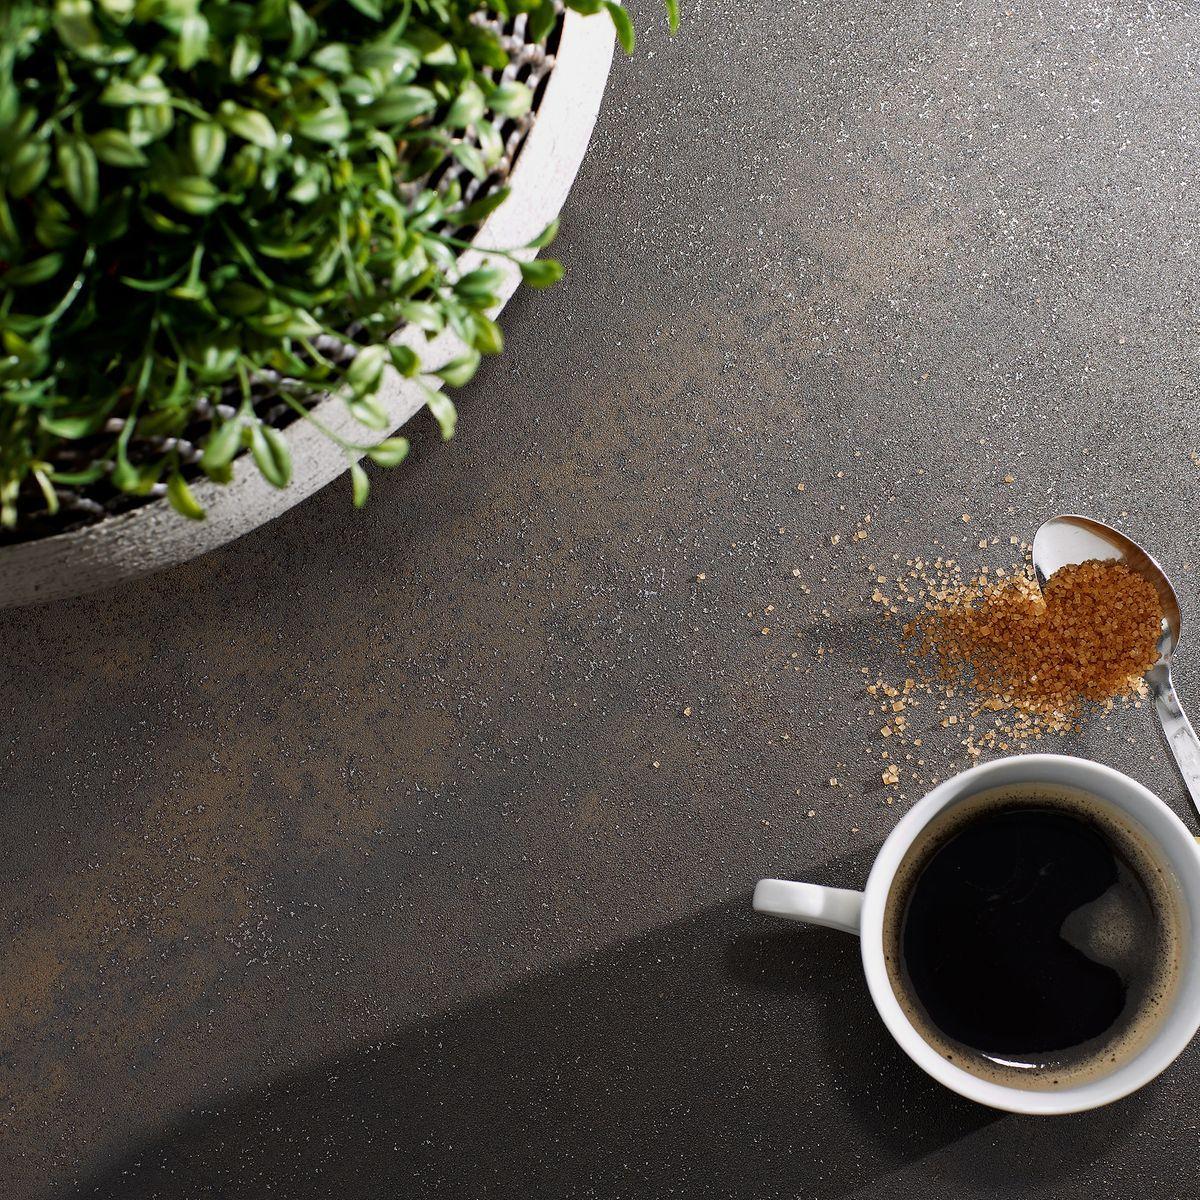 Table Argo 180 Cm Gres Cerame Iron Moss Pieds Noir Taille 8 Pers En 2019 Products Table Gres Cerame Et Taille